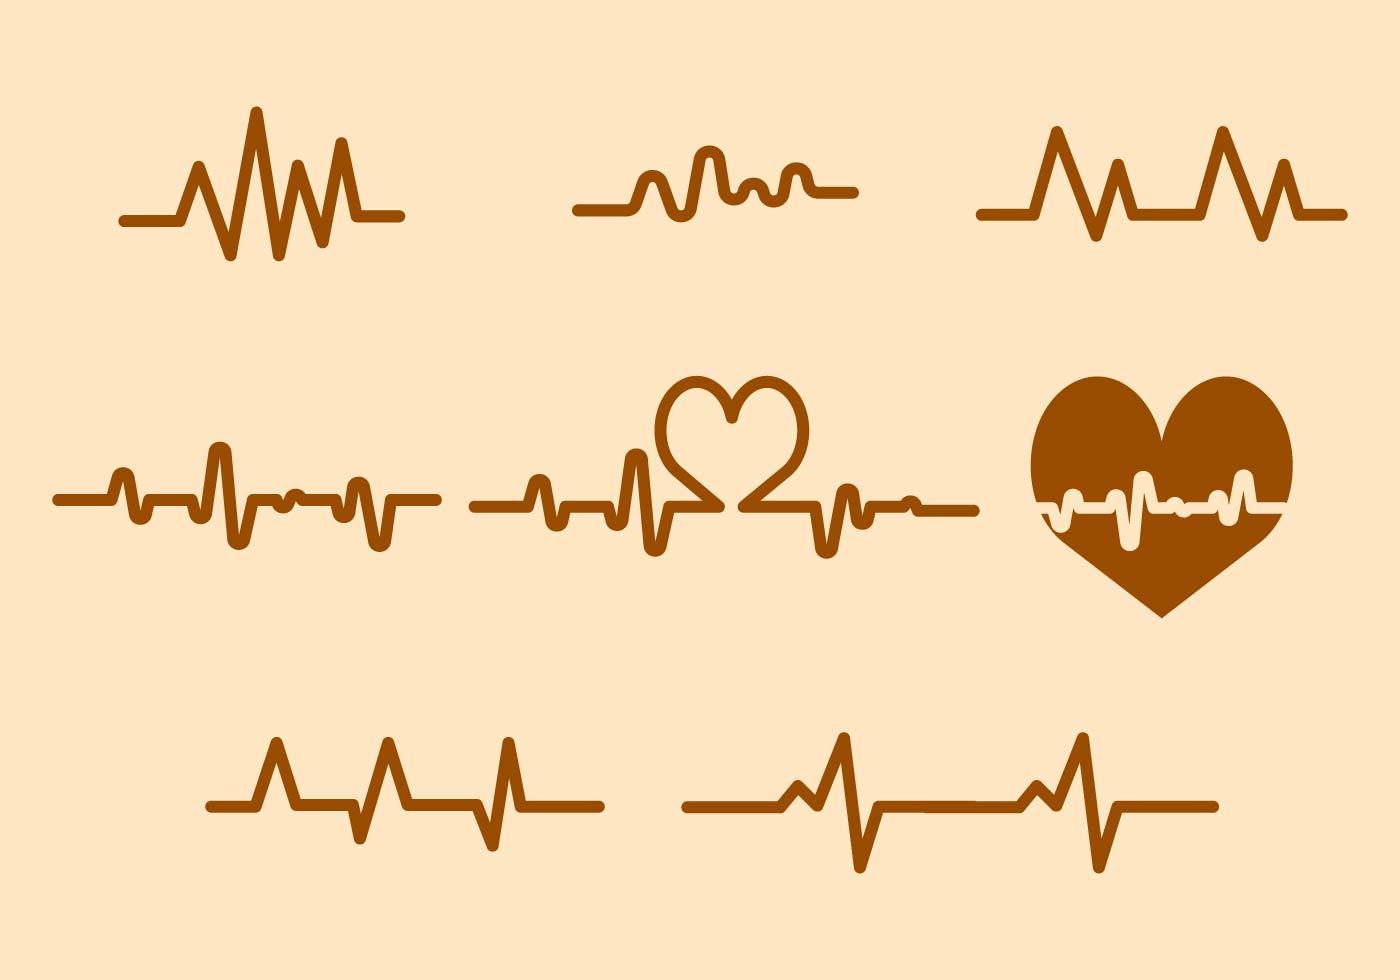 Heart Beat Free Vector Art 4921 Free Downloads